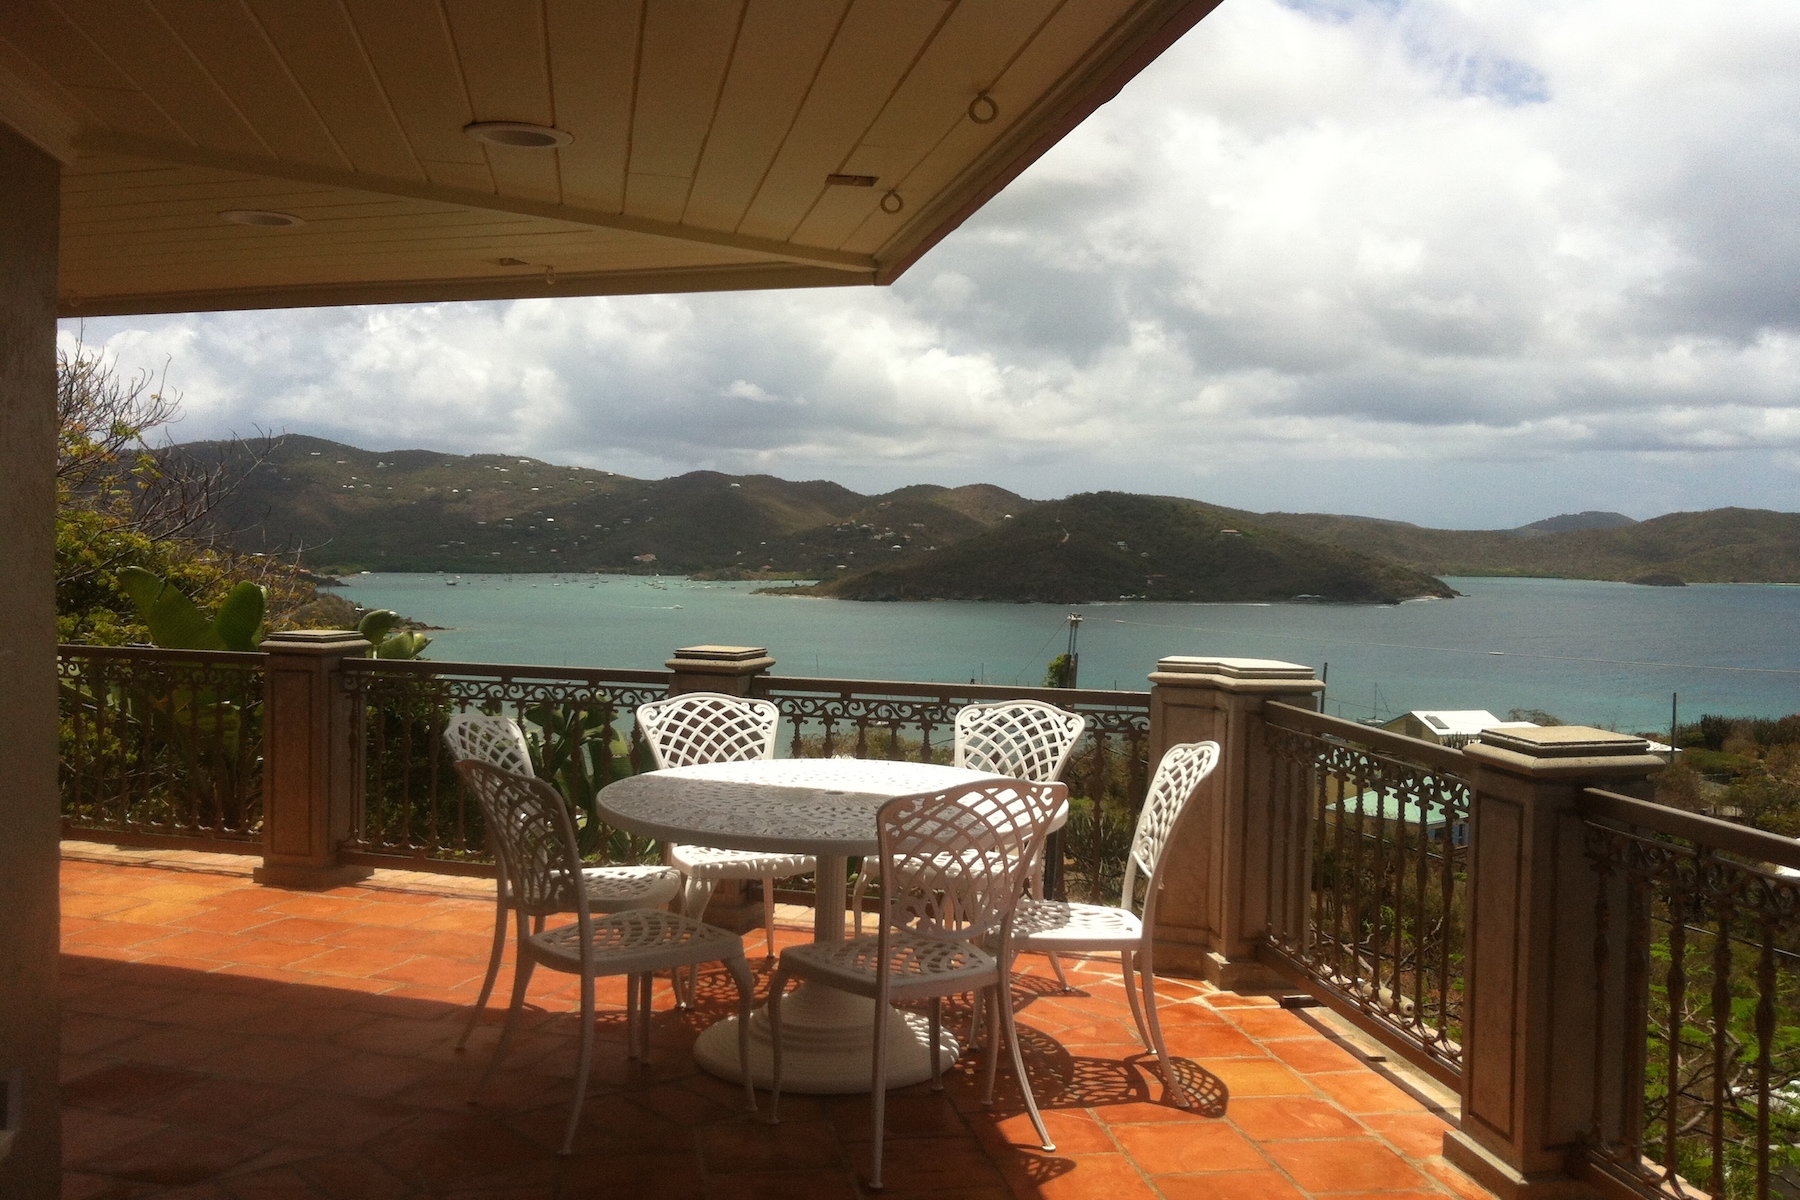 Single Family Home for Sale at Villa Agel 6B 21 St. Quaco & Zimmerman St John, 00830 United States Virgin Islands